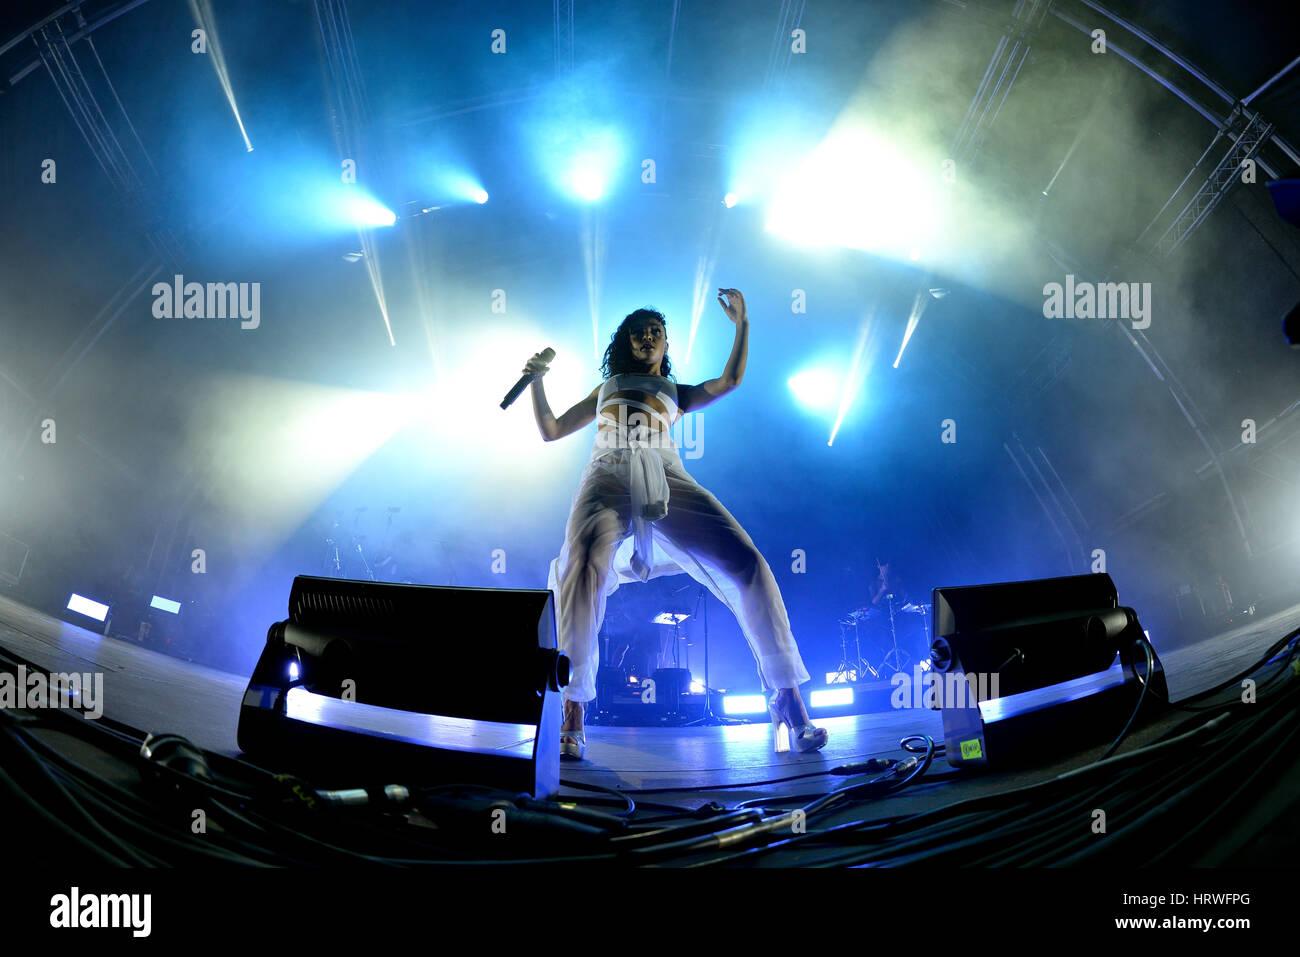 BARCELONA - JUN 20: FKA Twigs (band) in concert at Sonar Festival on June 20, 2015 in Barcelona, Spain. - Stock Image